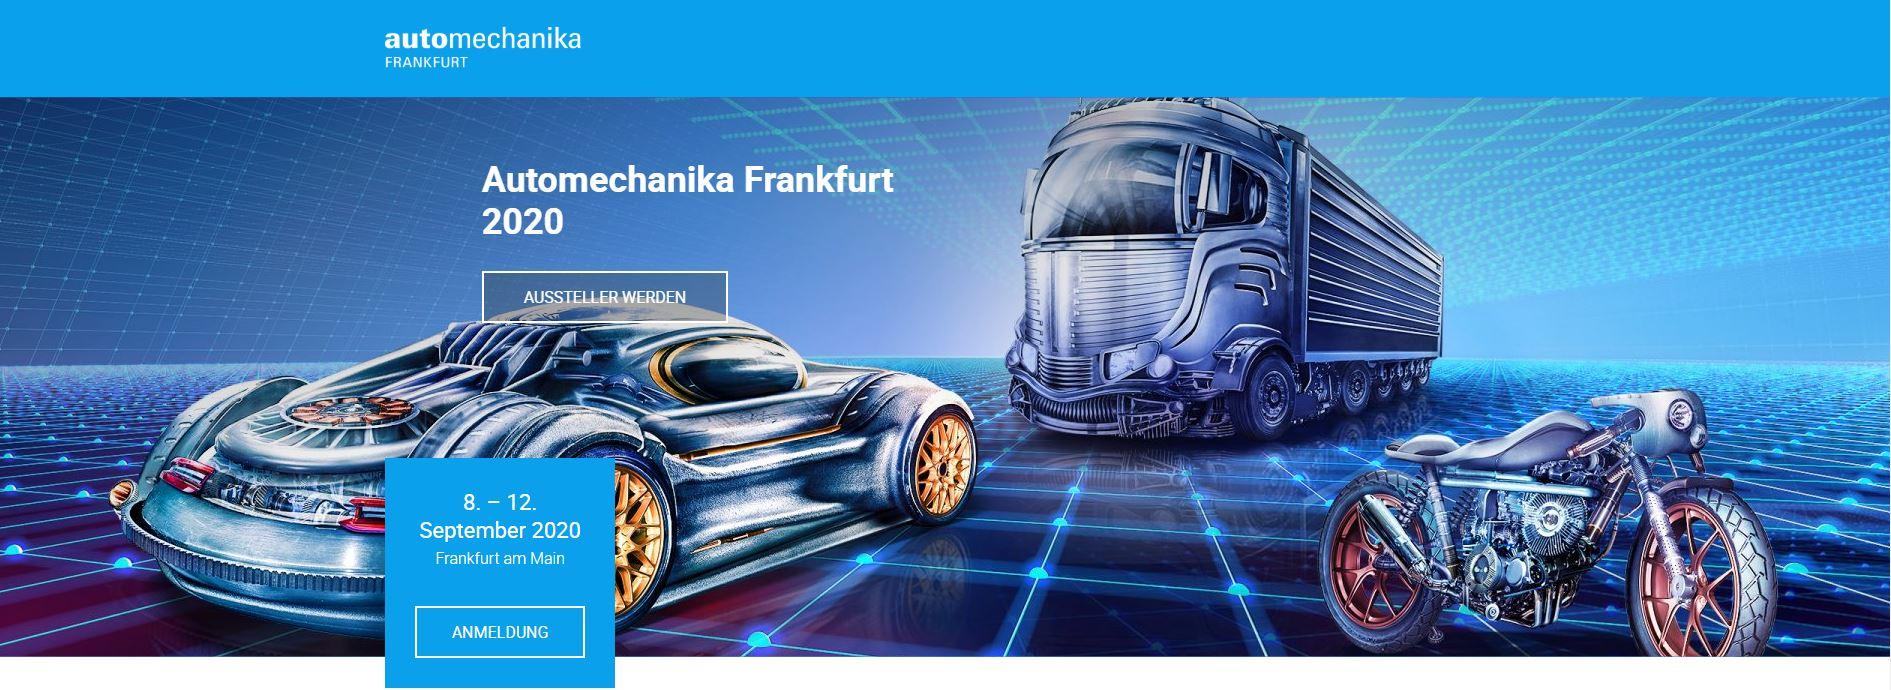 Automechanika Frankfurt 2020